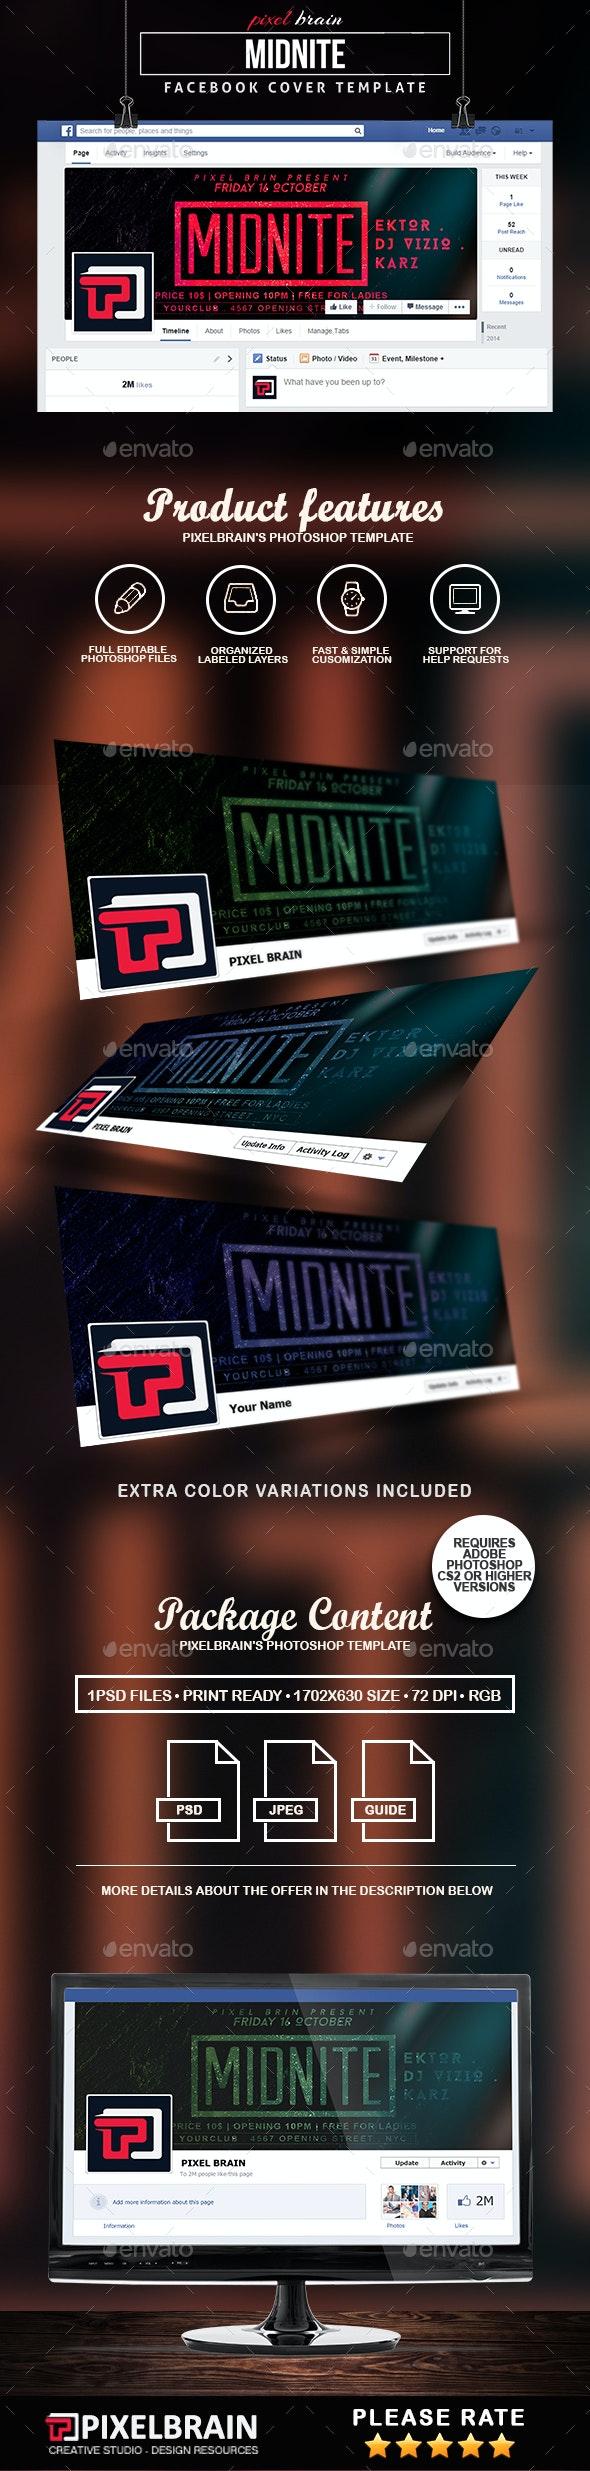 Midnite Facebook Cover Template - Facebook Timeline Covers Social Media